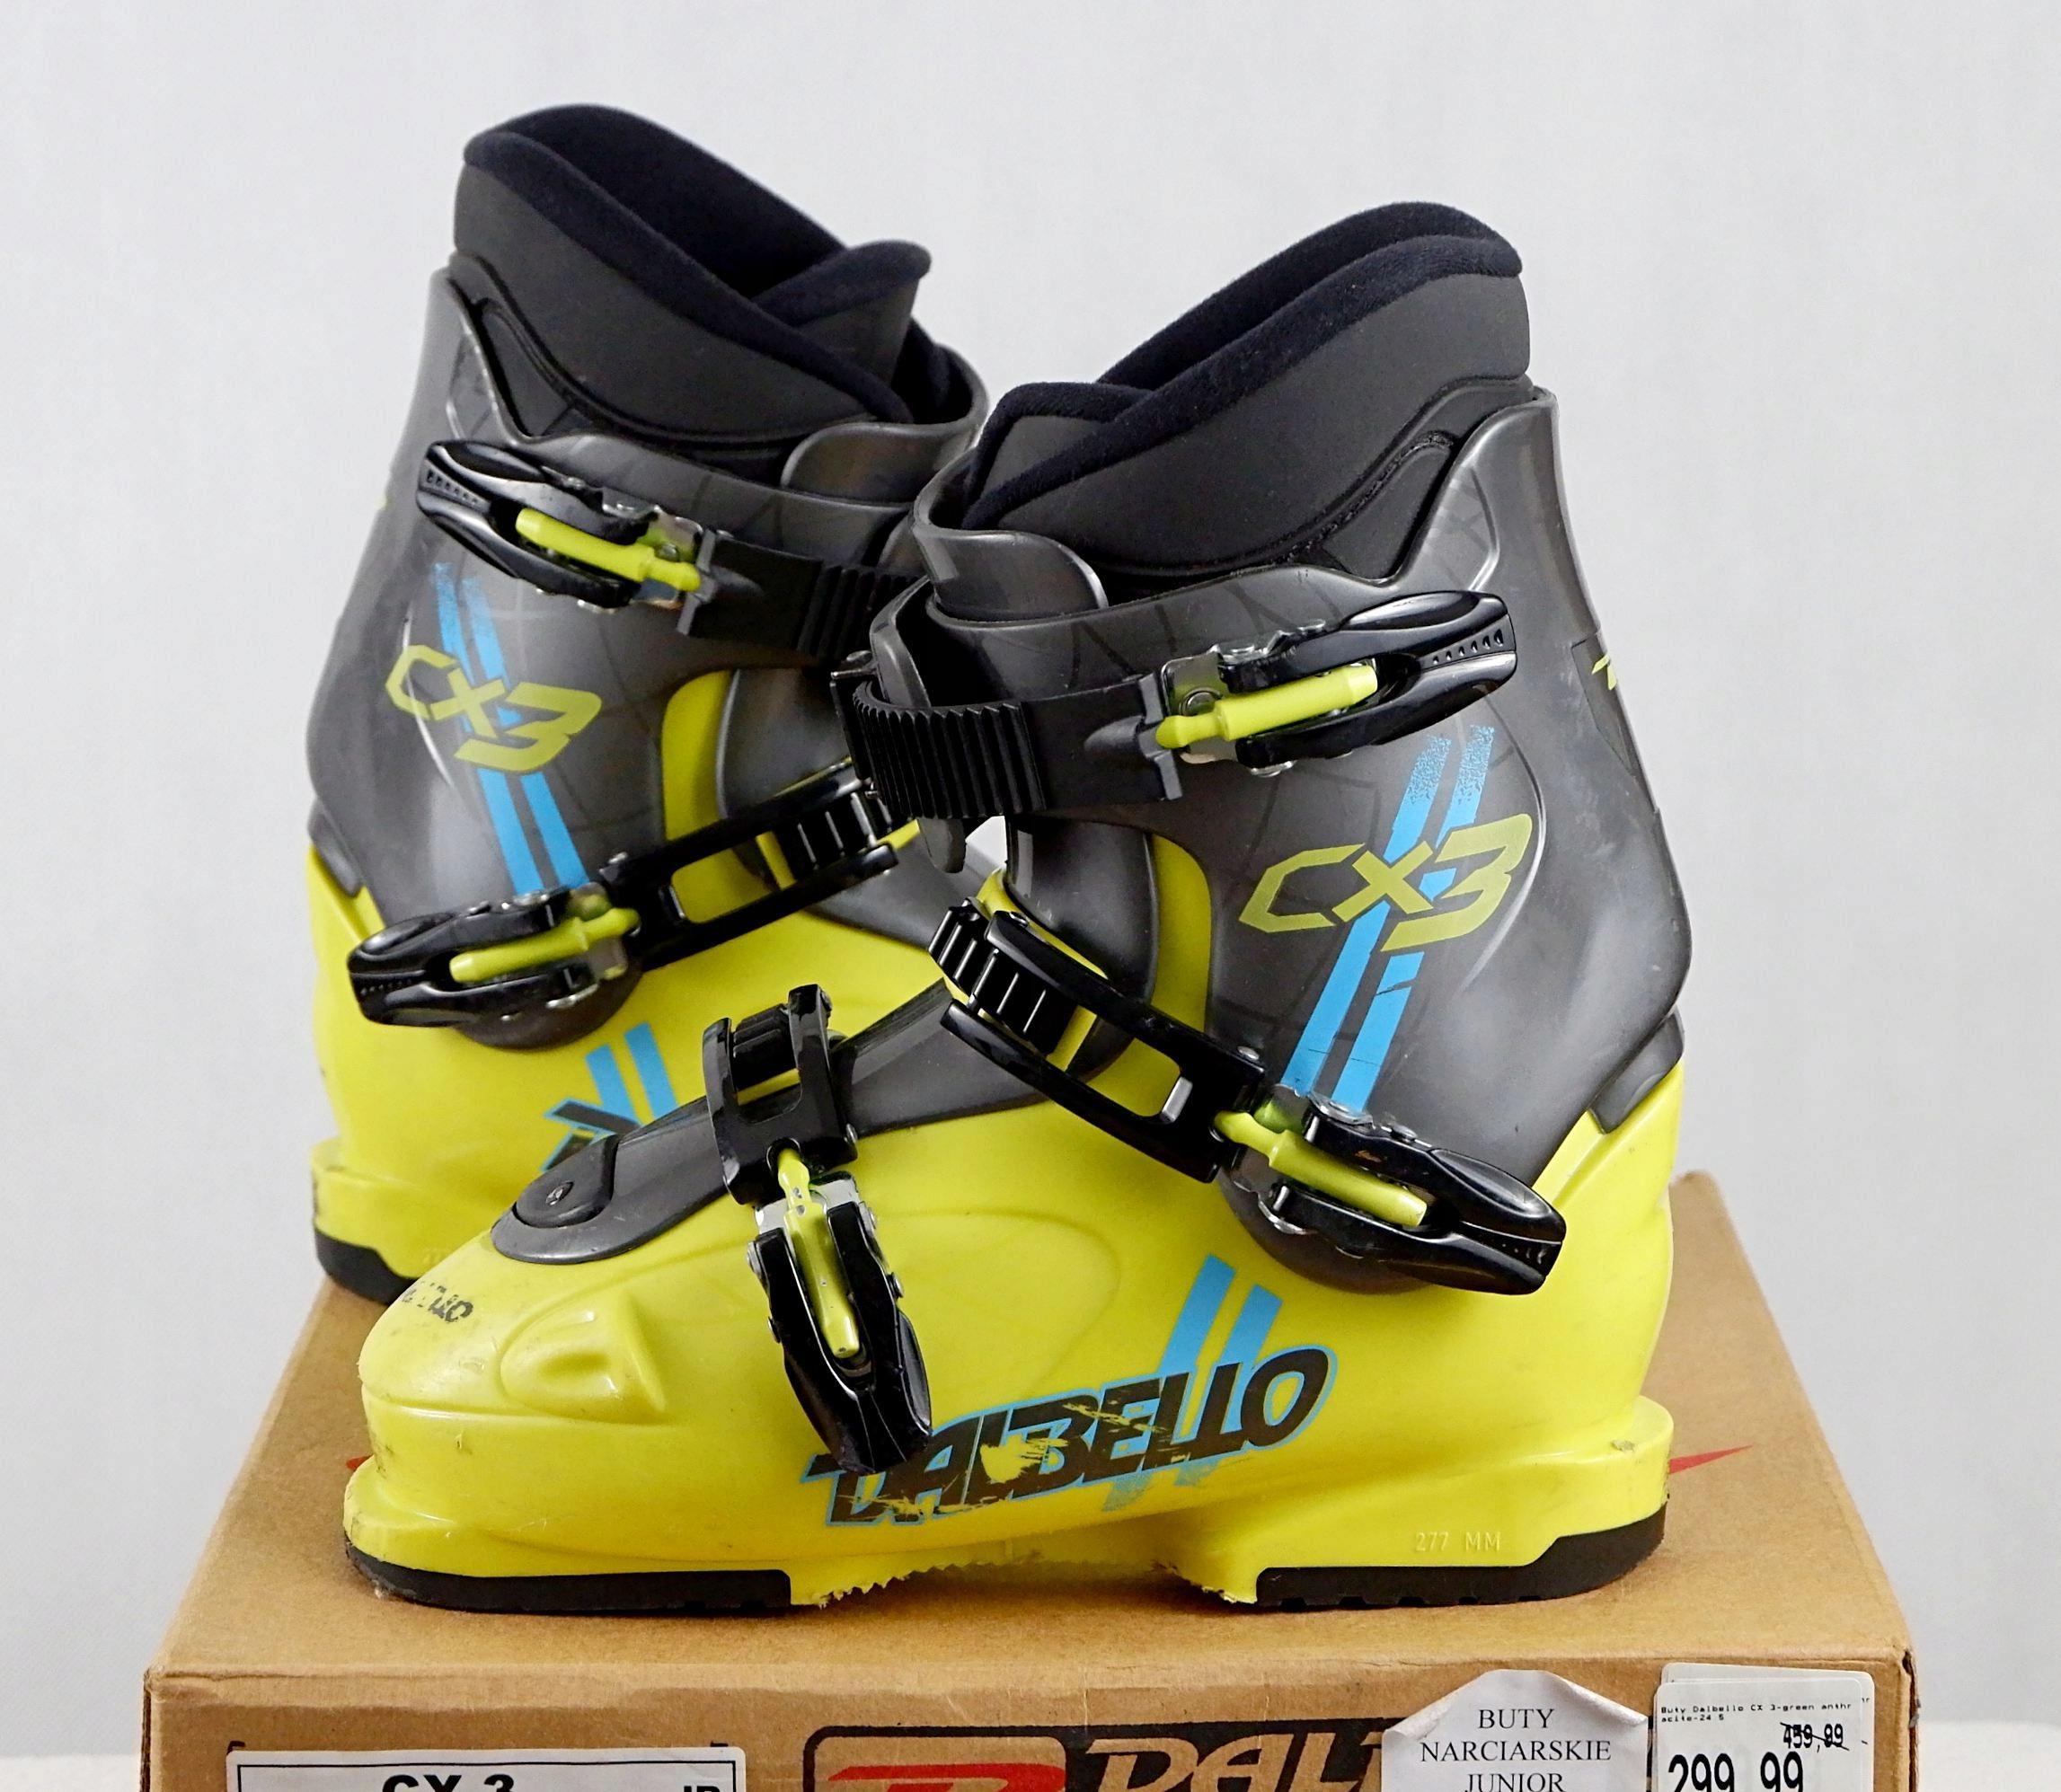 DALBELLO CX 3 JUNIOR buty narciarskie 277mm 38